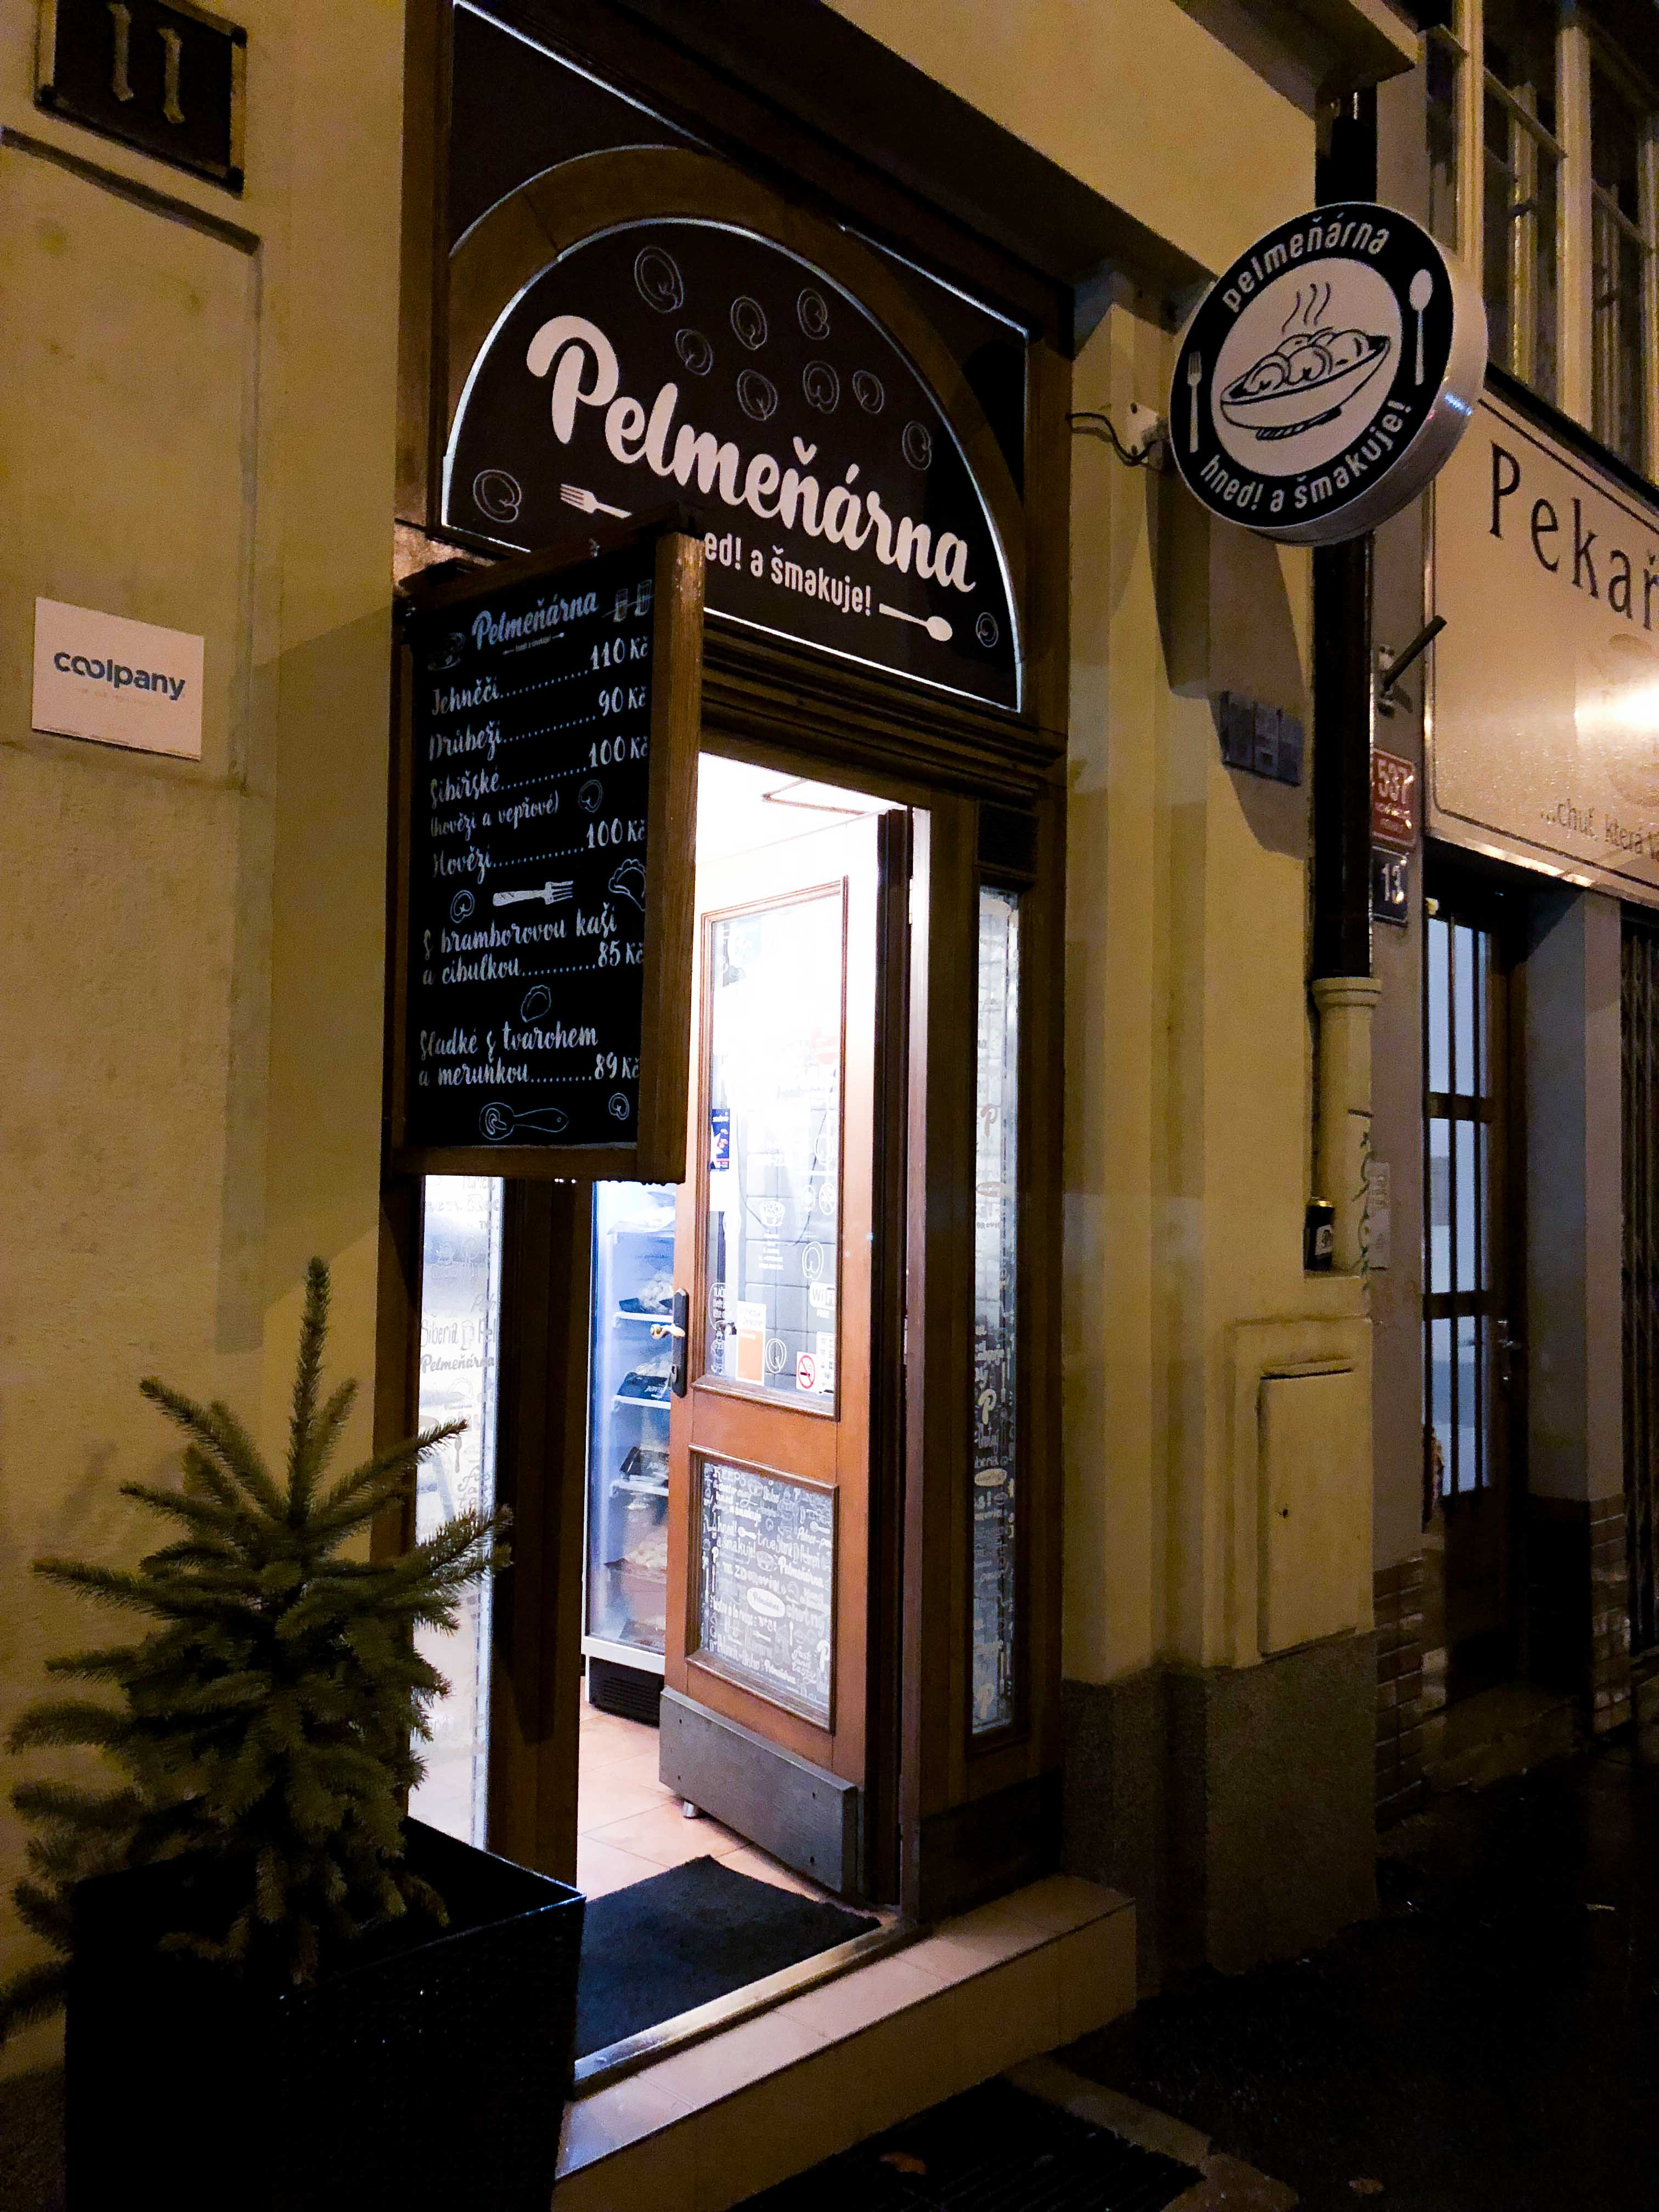 Pelmeneria Pelmeňárna Teigtaschen Restaurant Insider Tipps Prag Food Tipps besten Restaurants Reiseblog Pelmeni Prague